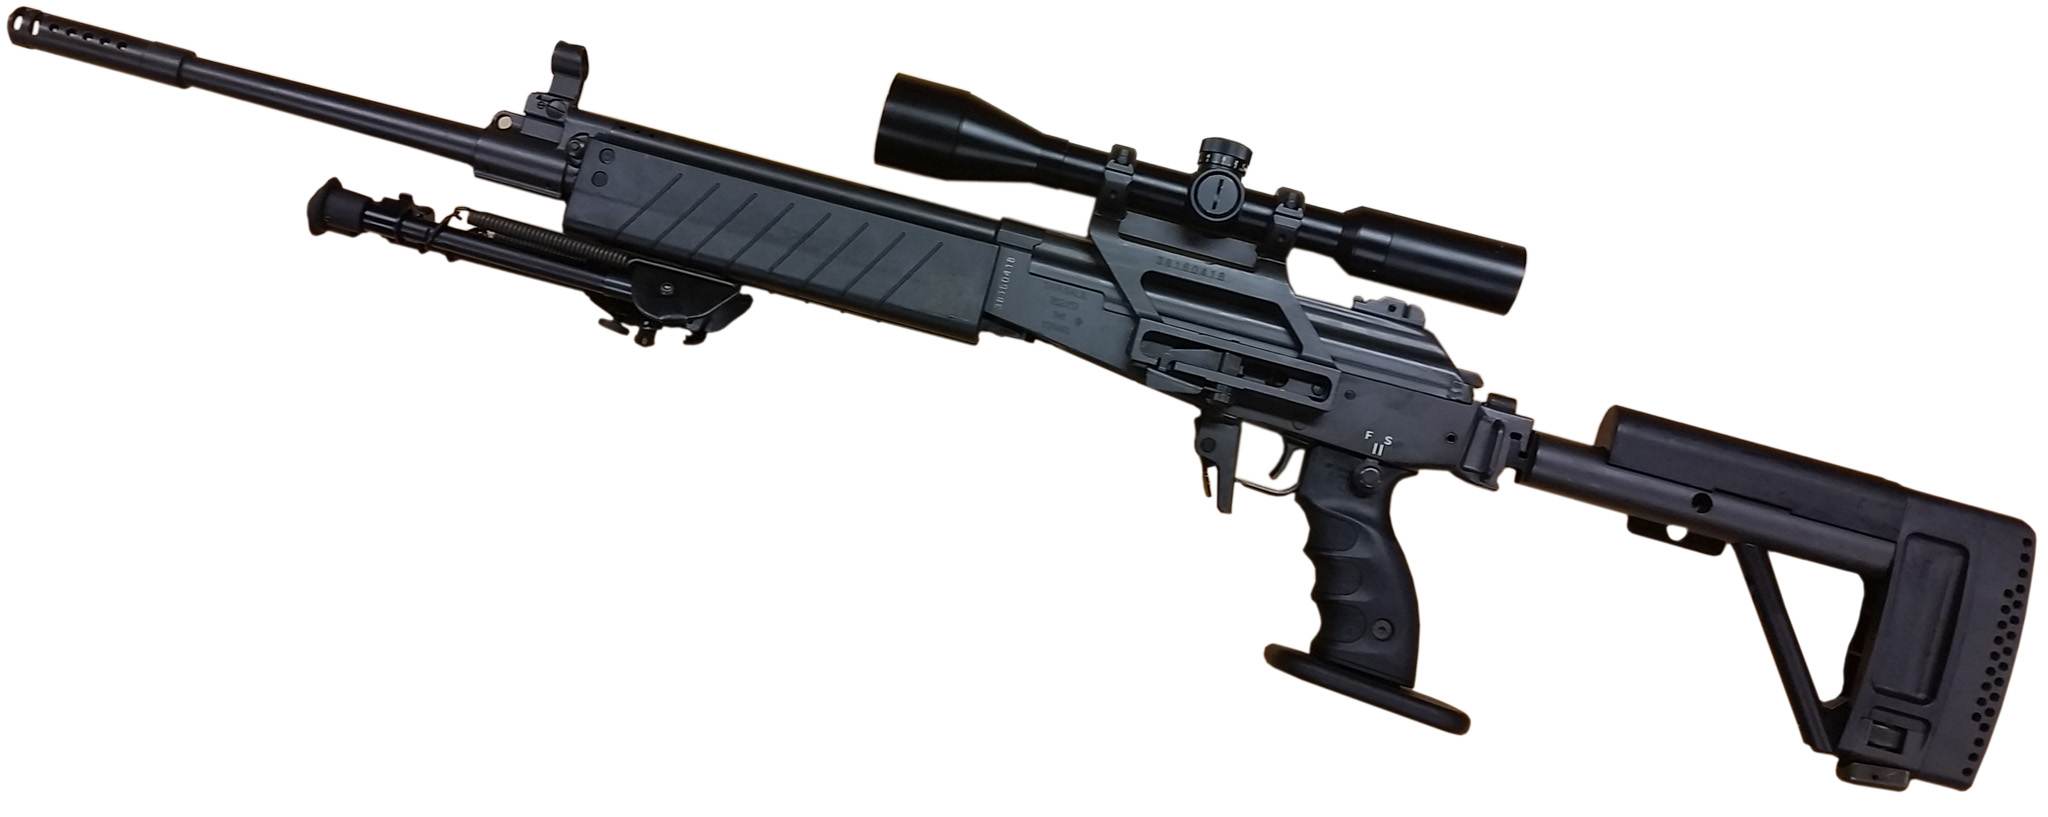 Снайперская винтовка Galil Galatz